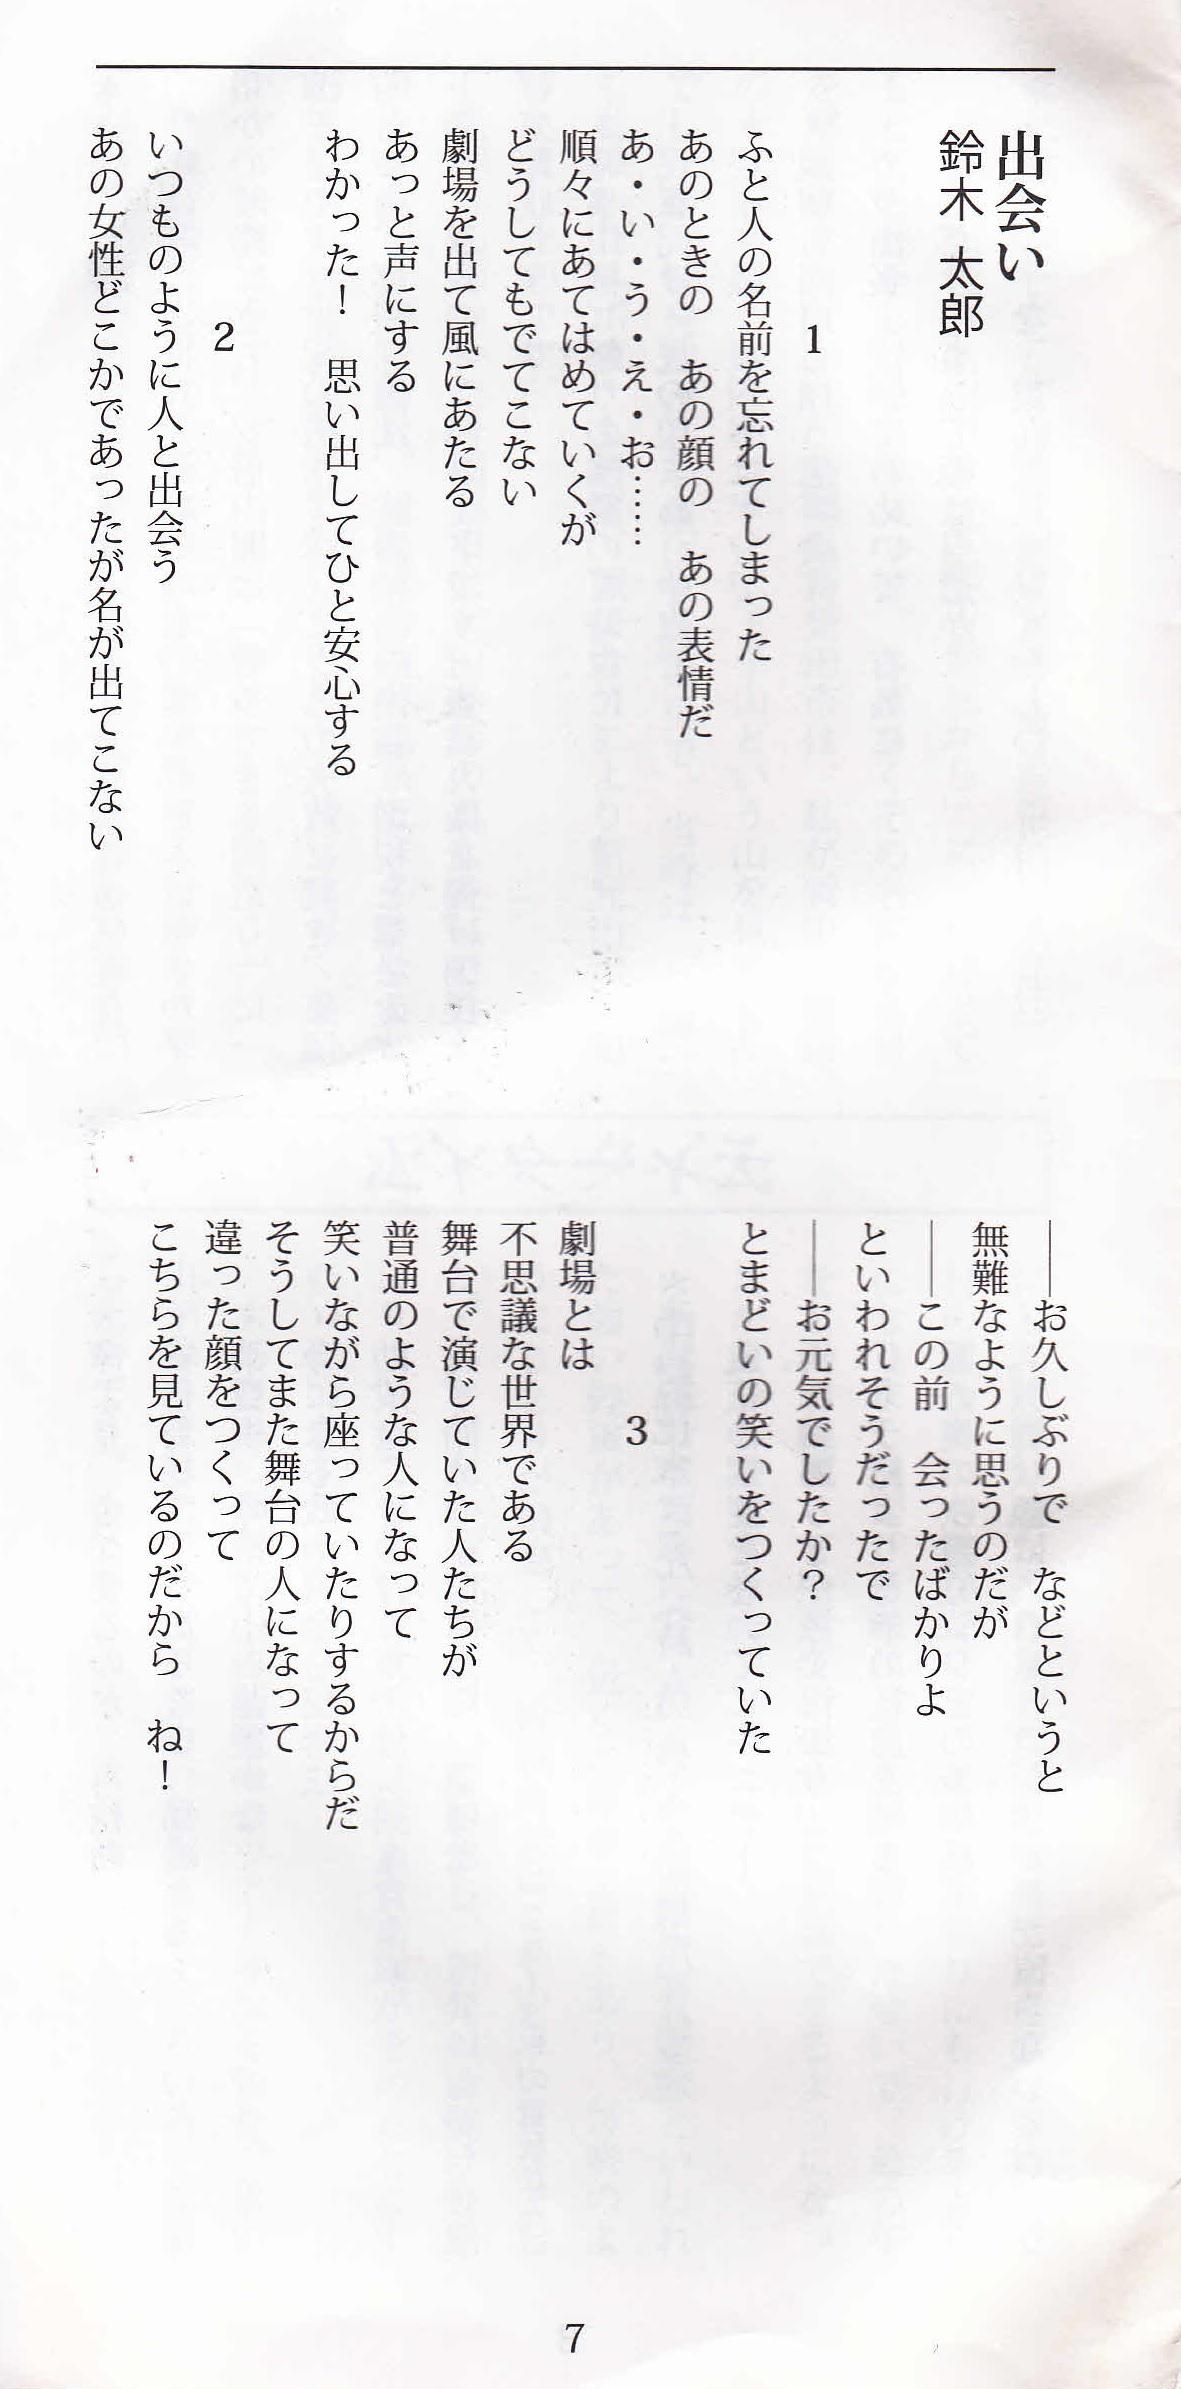 太郎の部屋 32号